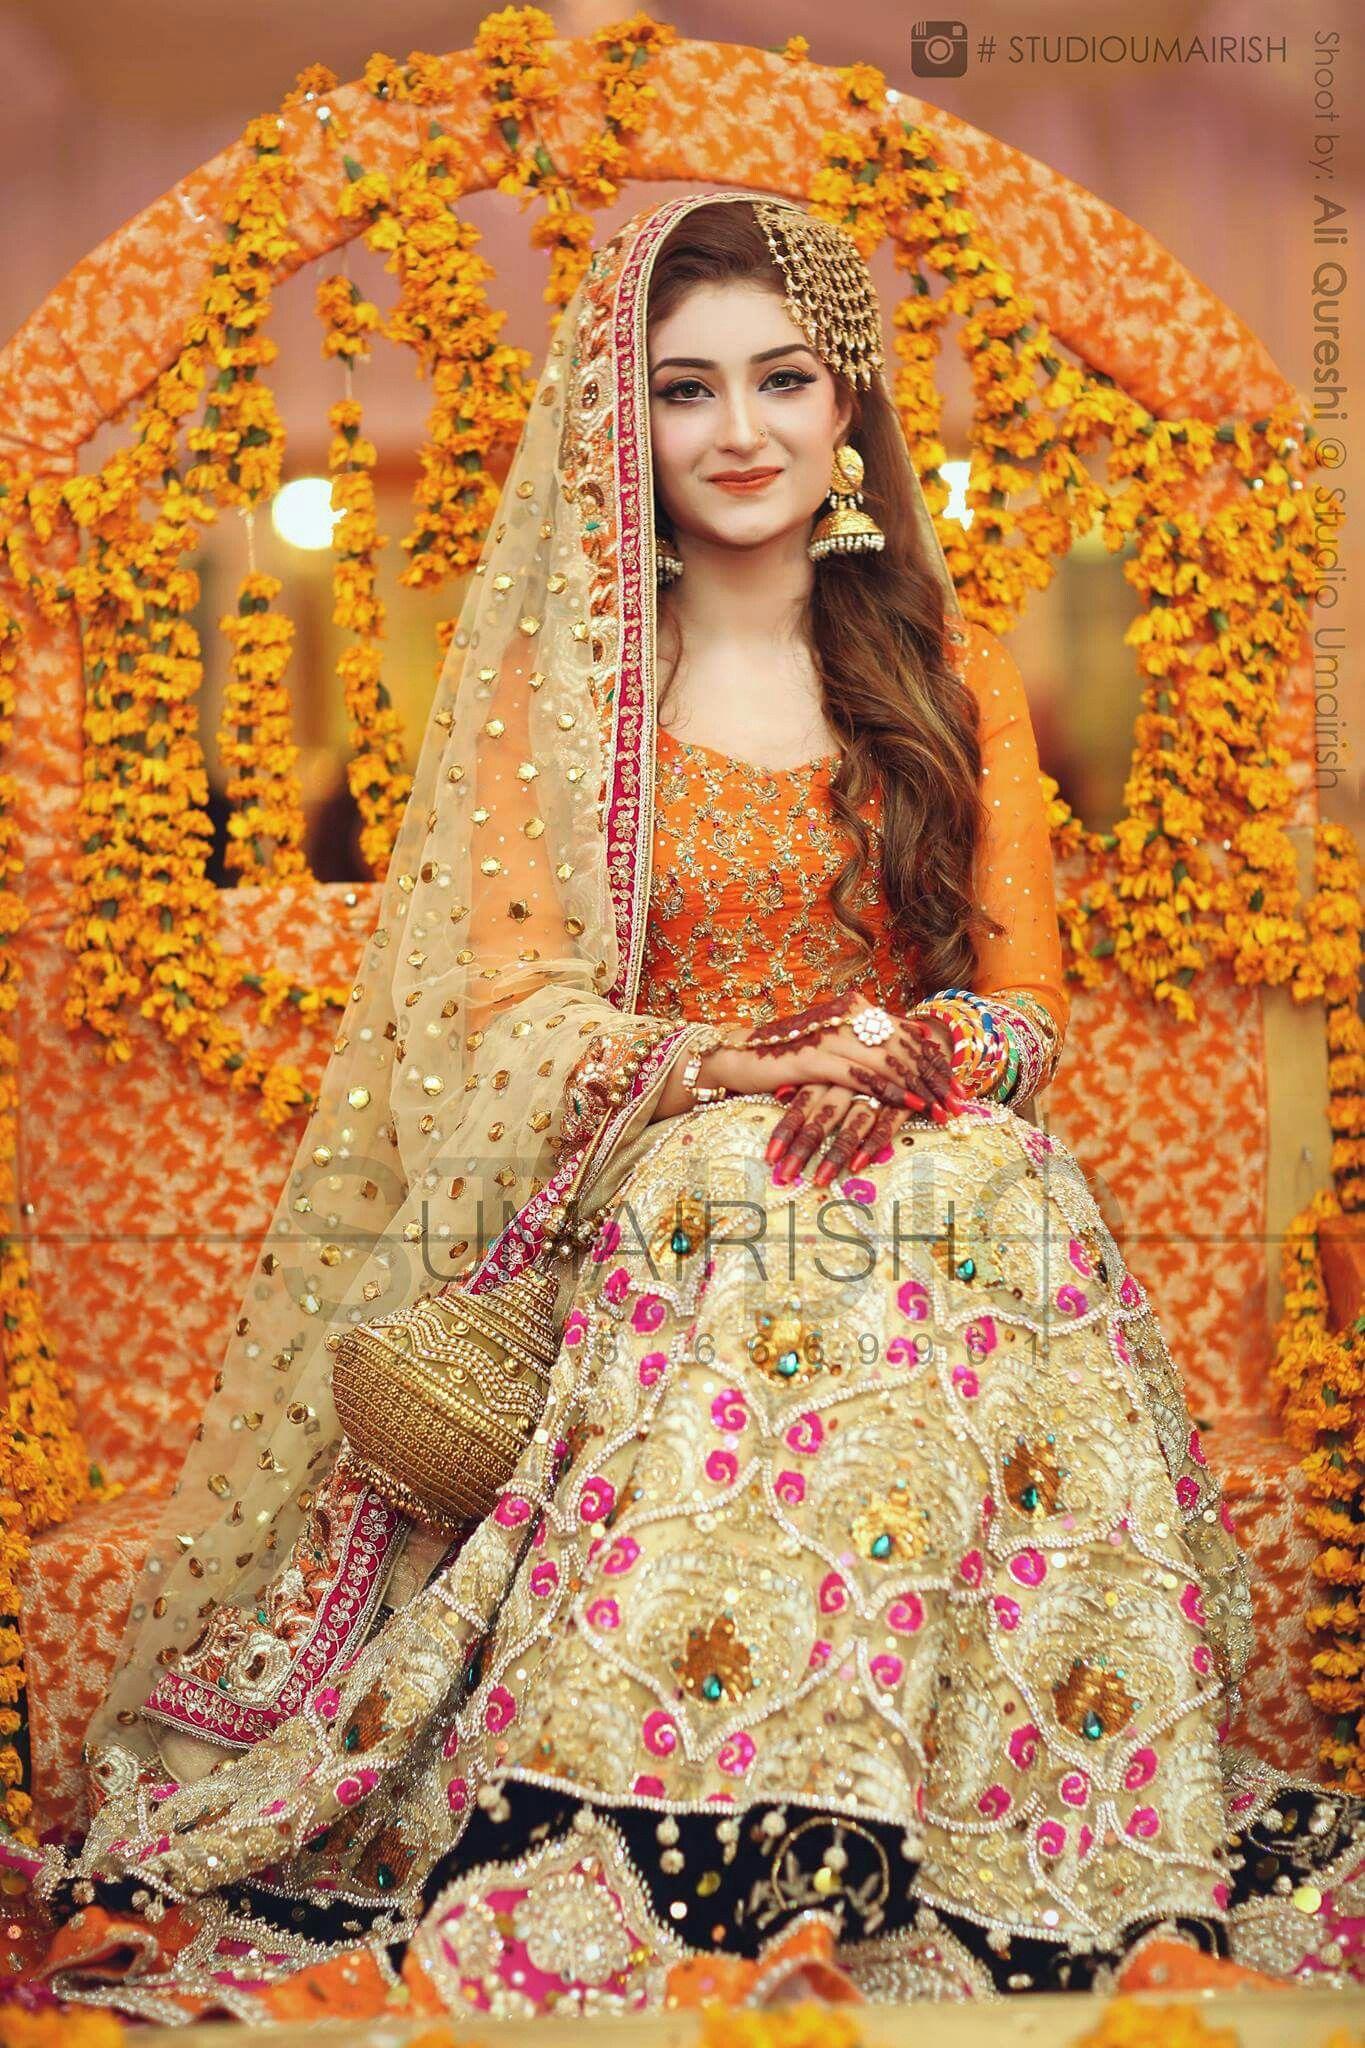 Pakistani mehndi bride the pakistani bride pinterest for Pakistani wedding mehndi dresses